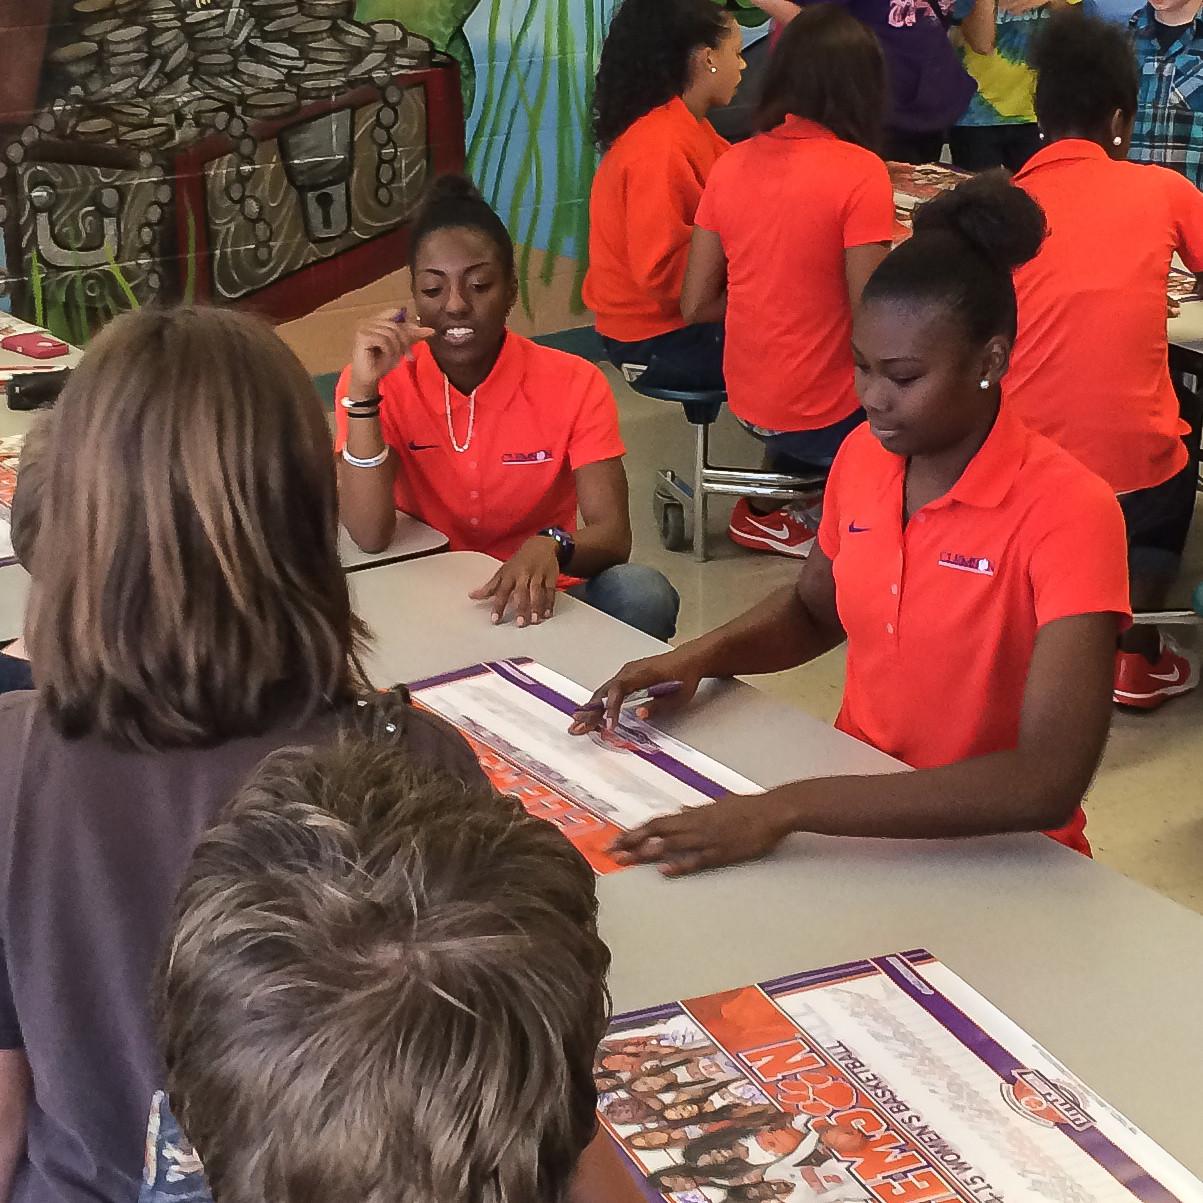 Women's Hoops Visits Elementary School